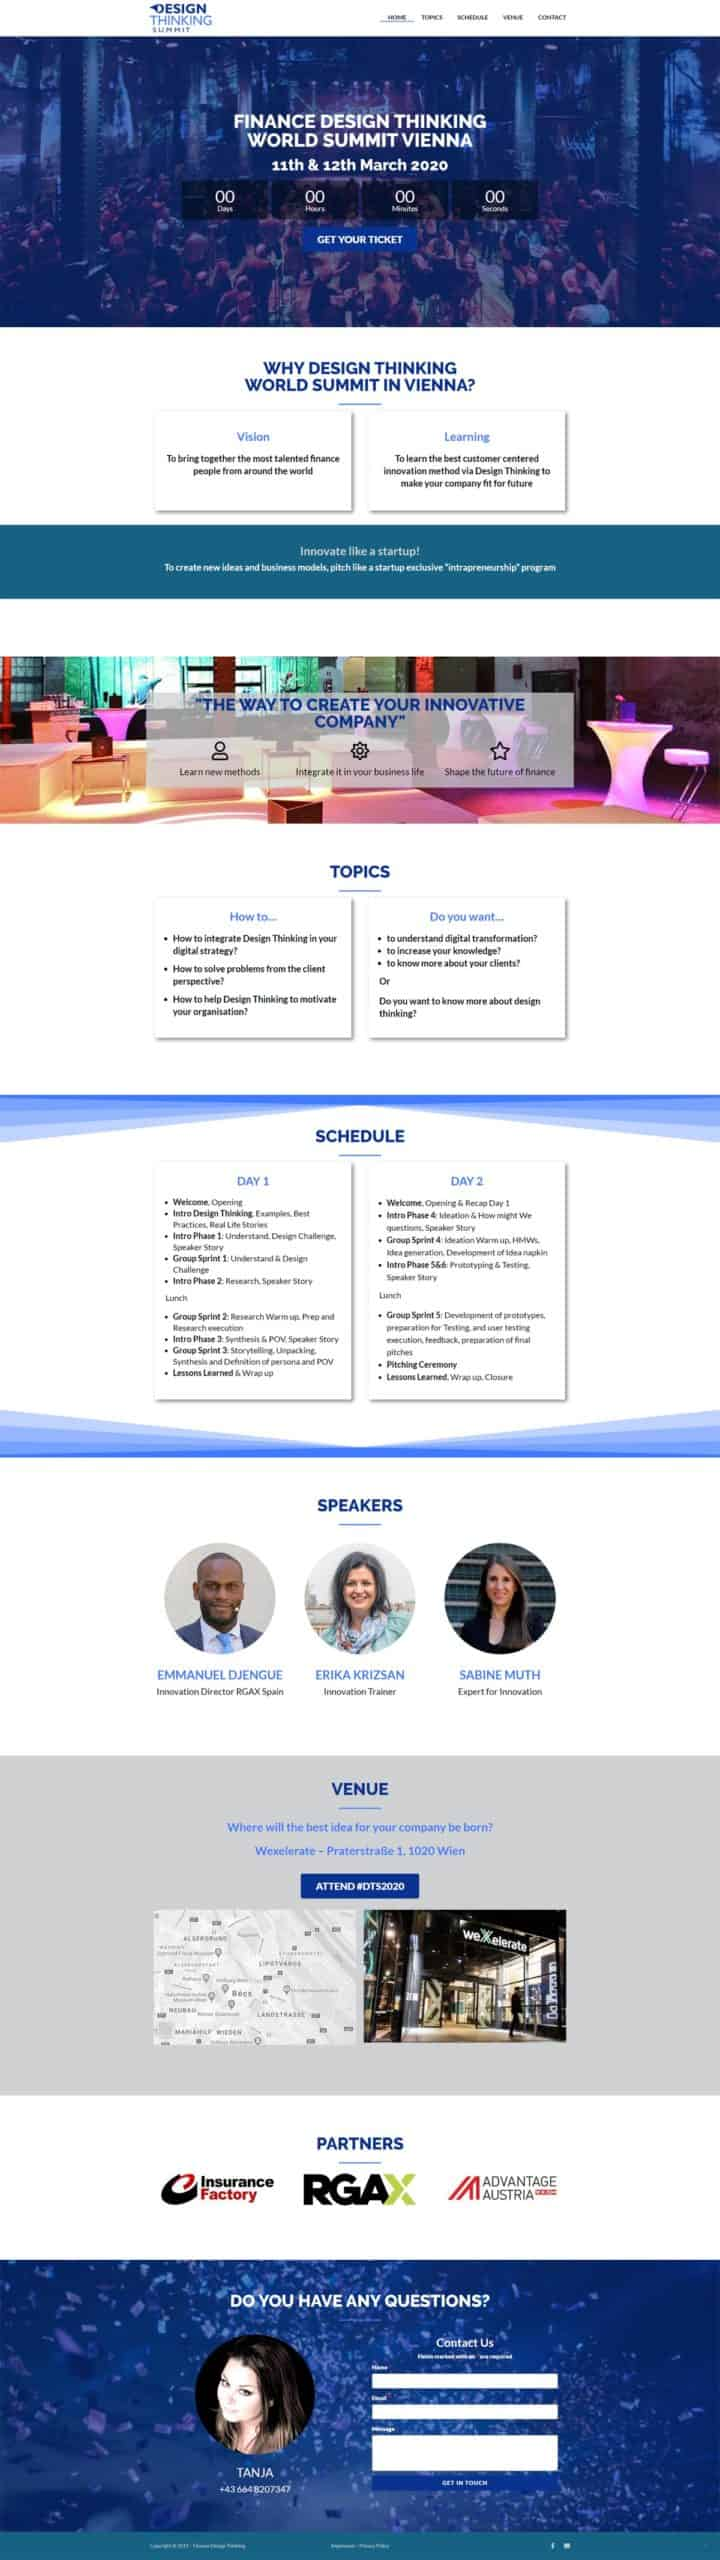 financedesignthinking.com portfolio